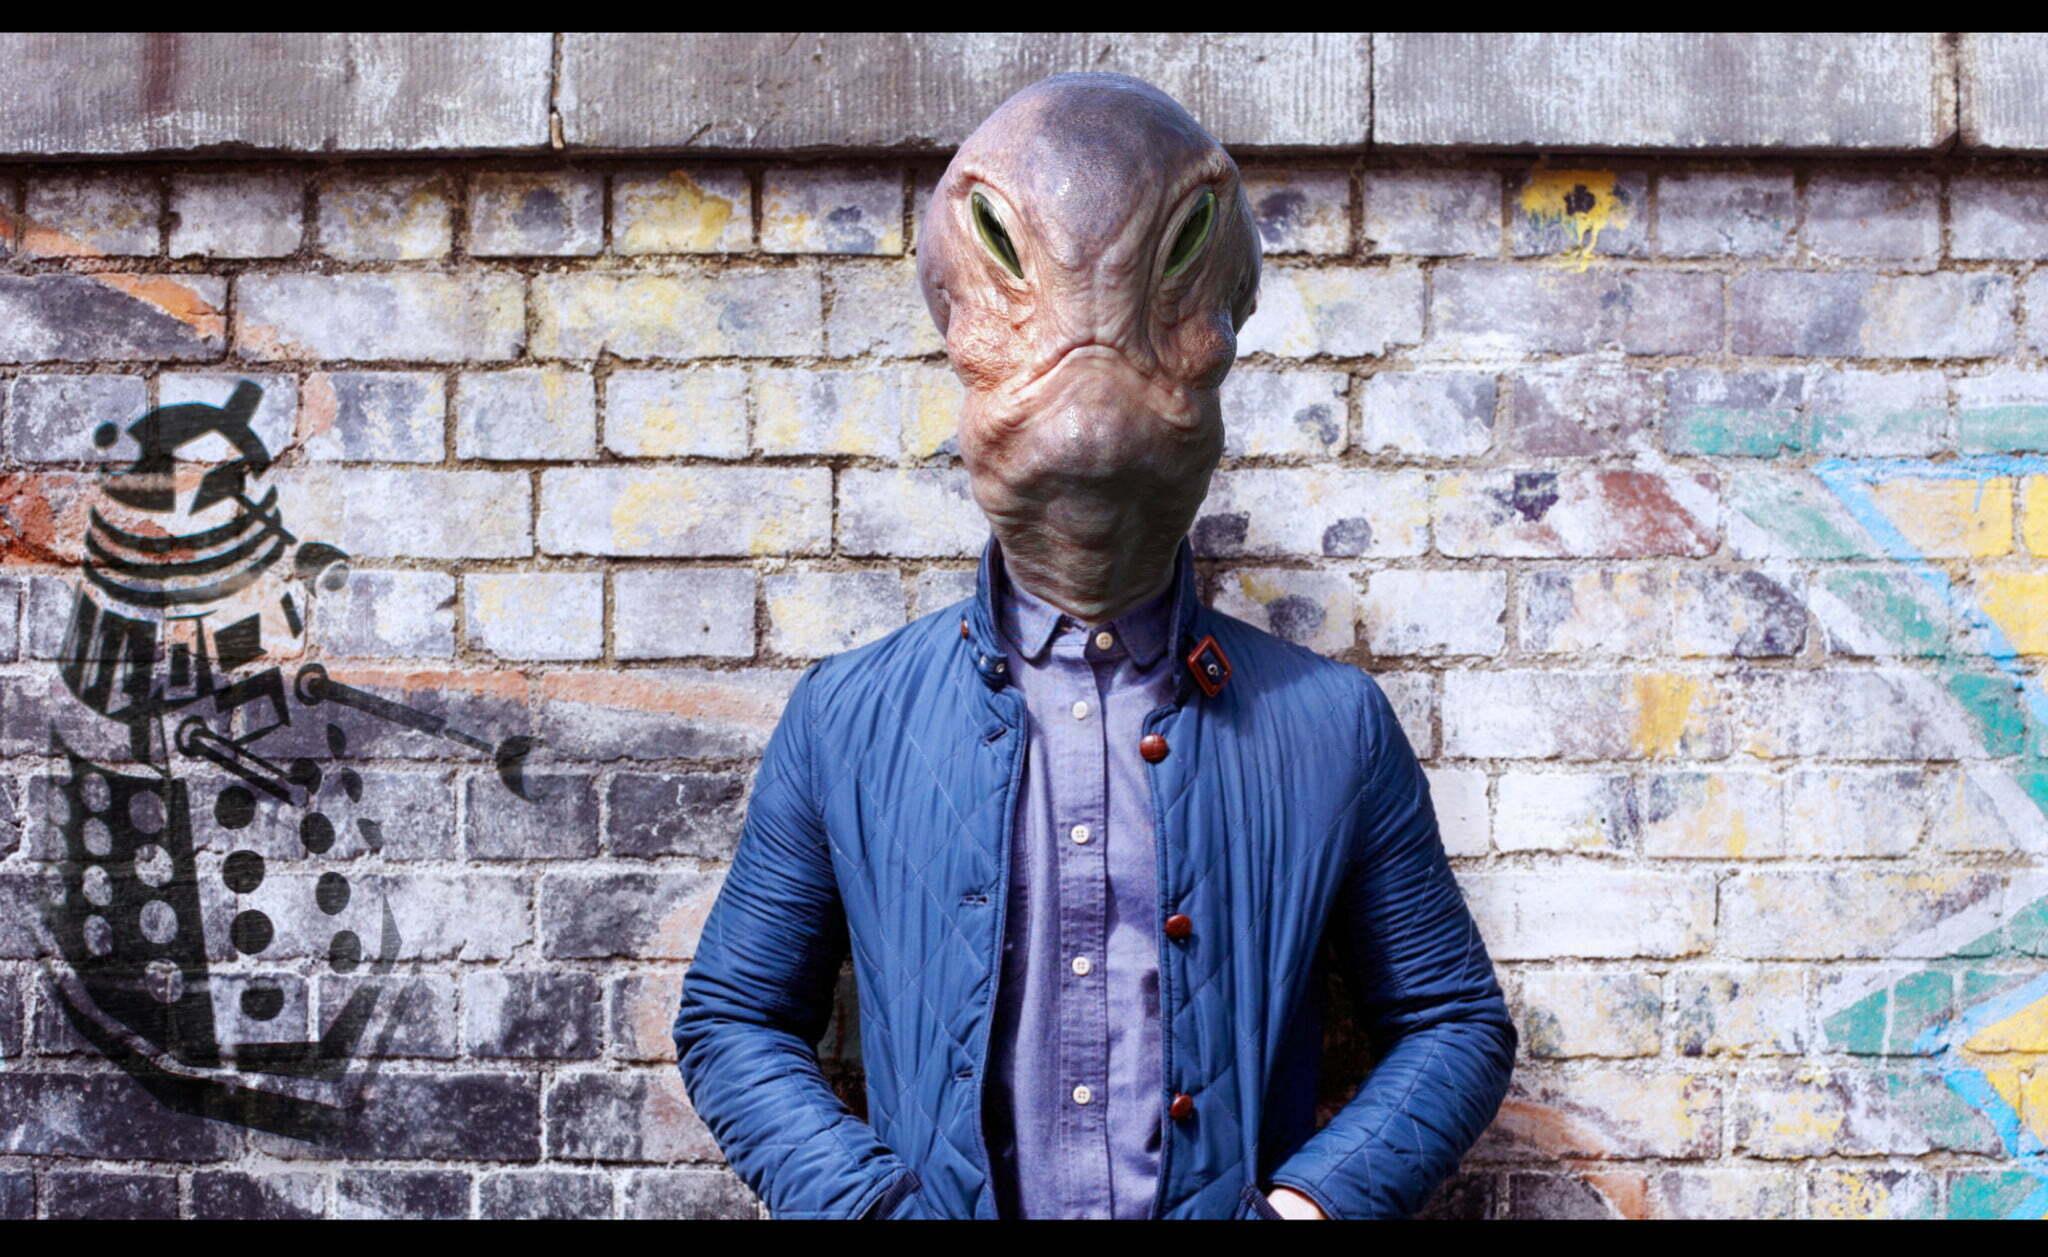 3D Fashionable Alien Creature Illustration